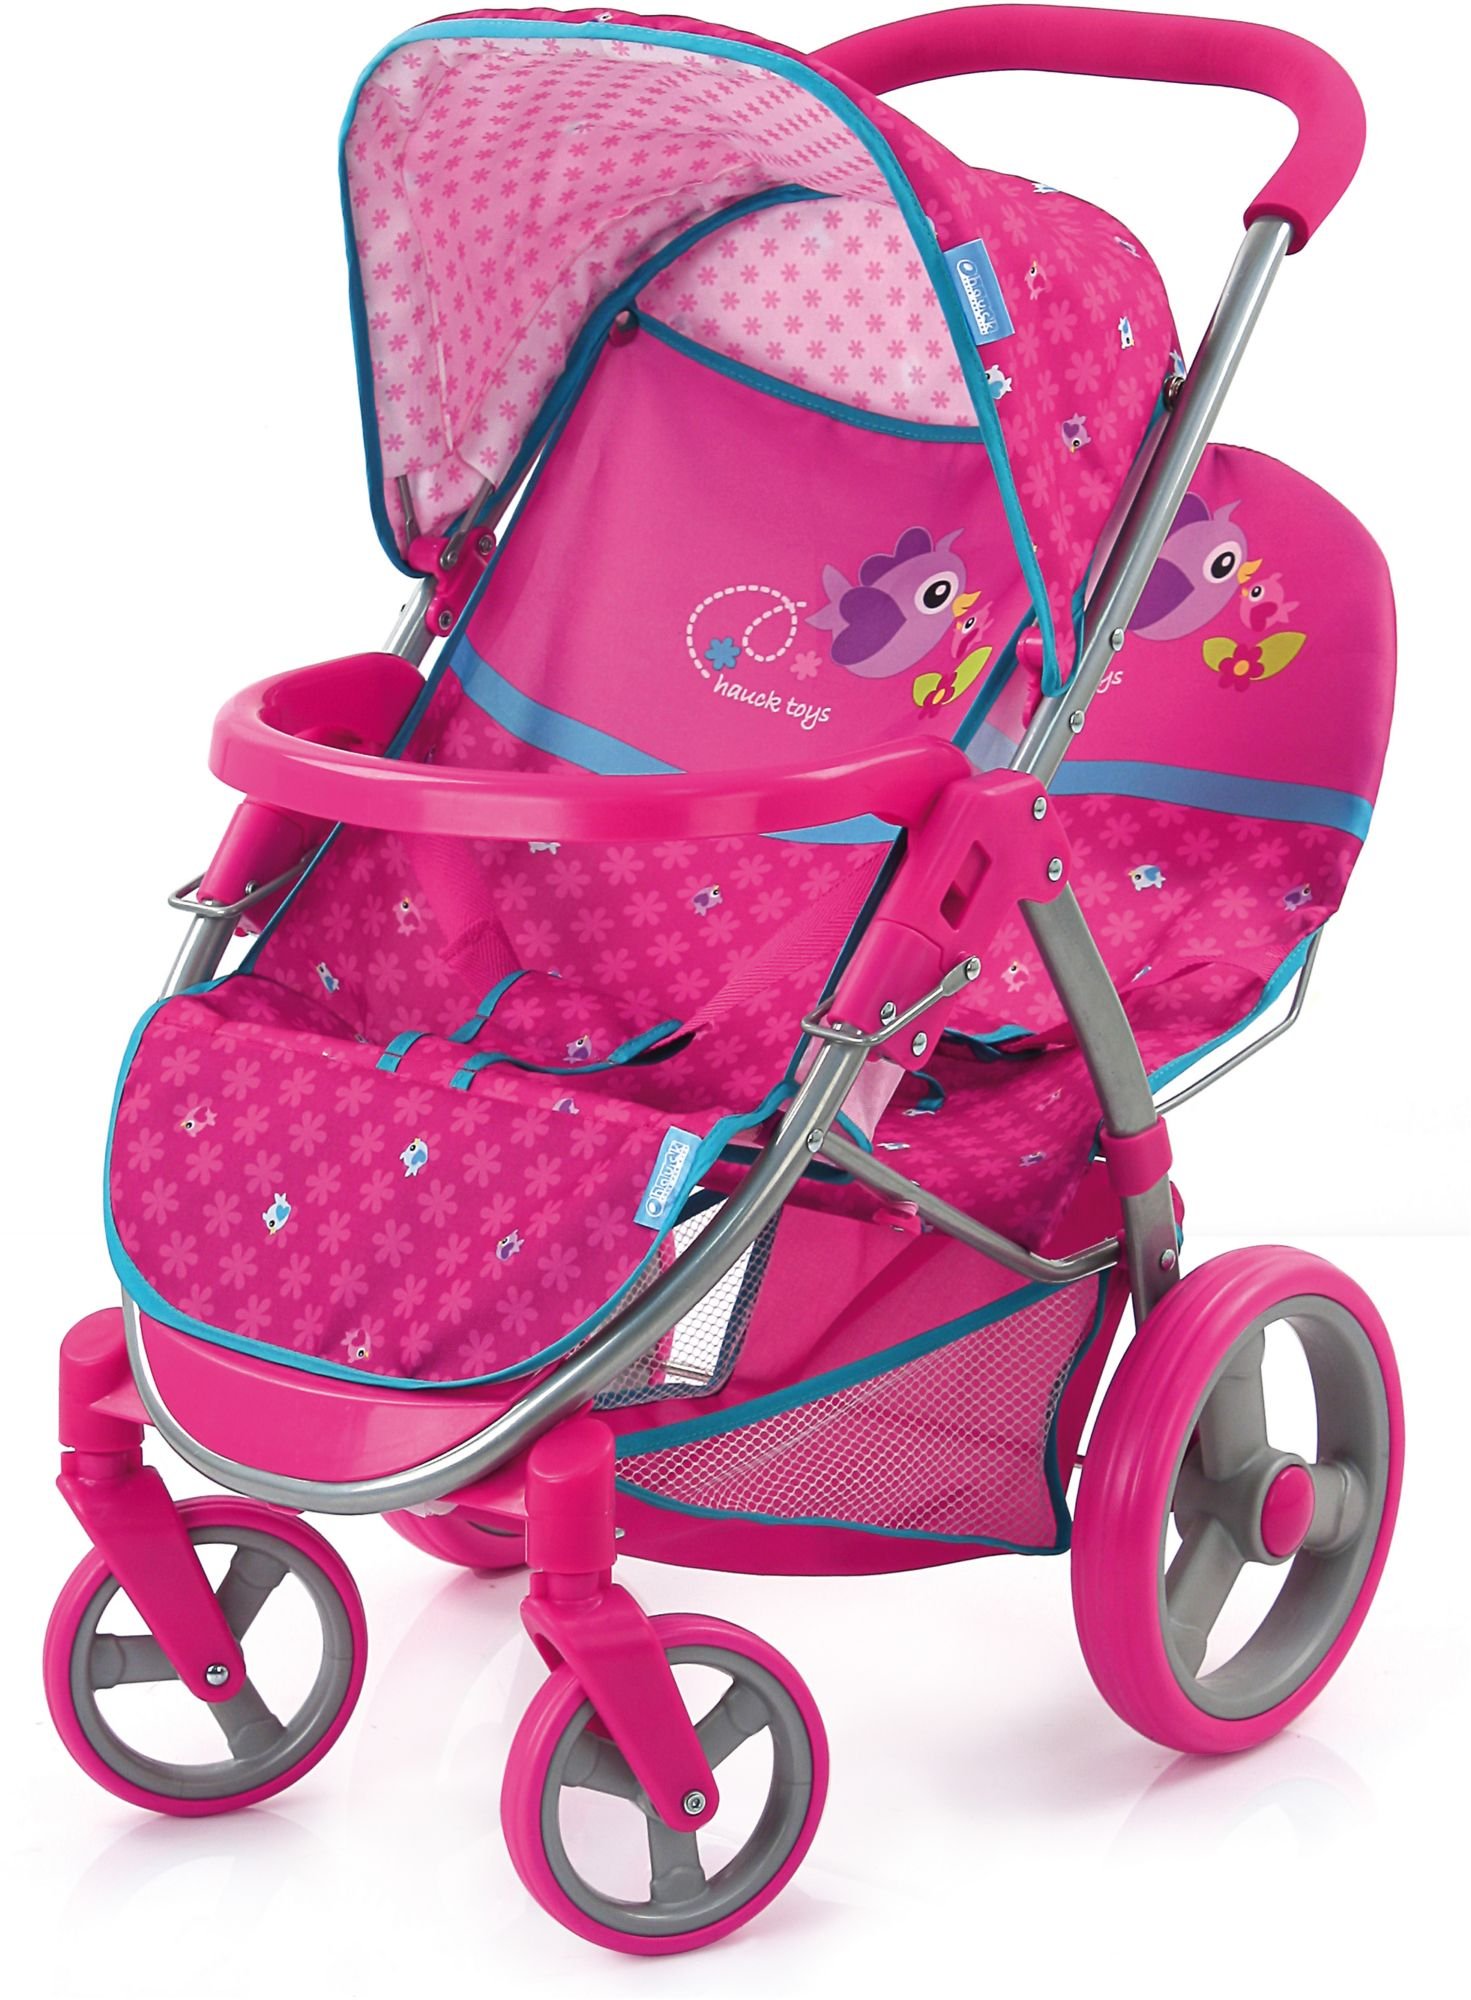 HAUCK TOYS FOR KIDS hauck TOYS FOR KIDS Puppenwagen, »Malibu Duo, Birdie Pink«